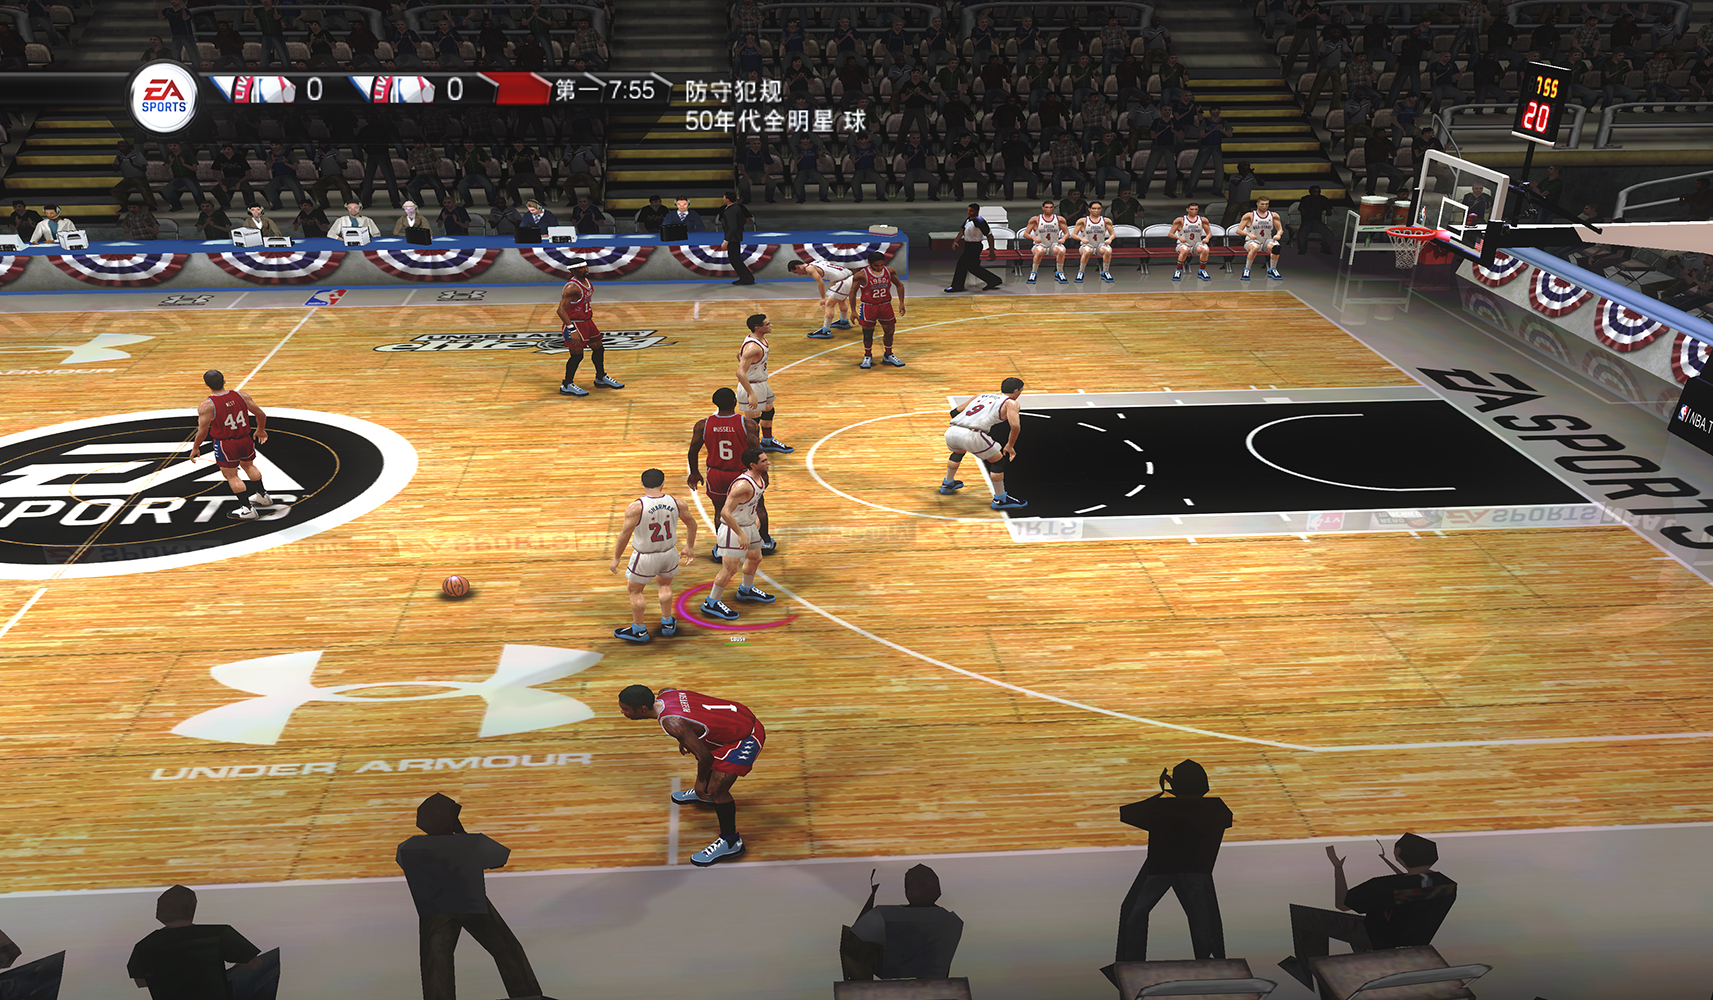 NBA LIVE 08【4K】-2021-03-31-01-16-45-106副本.jpg